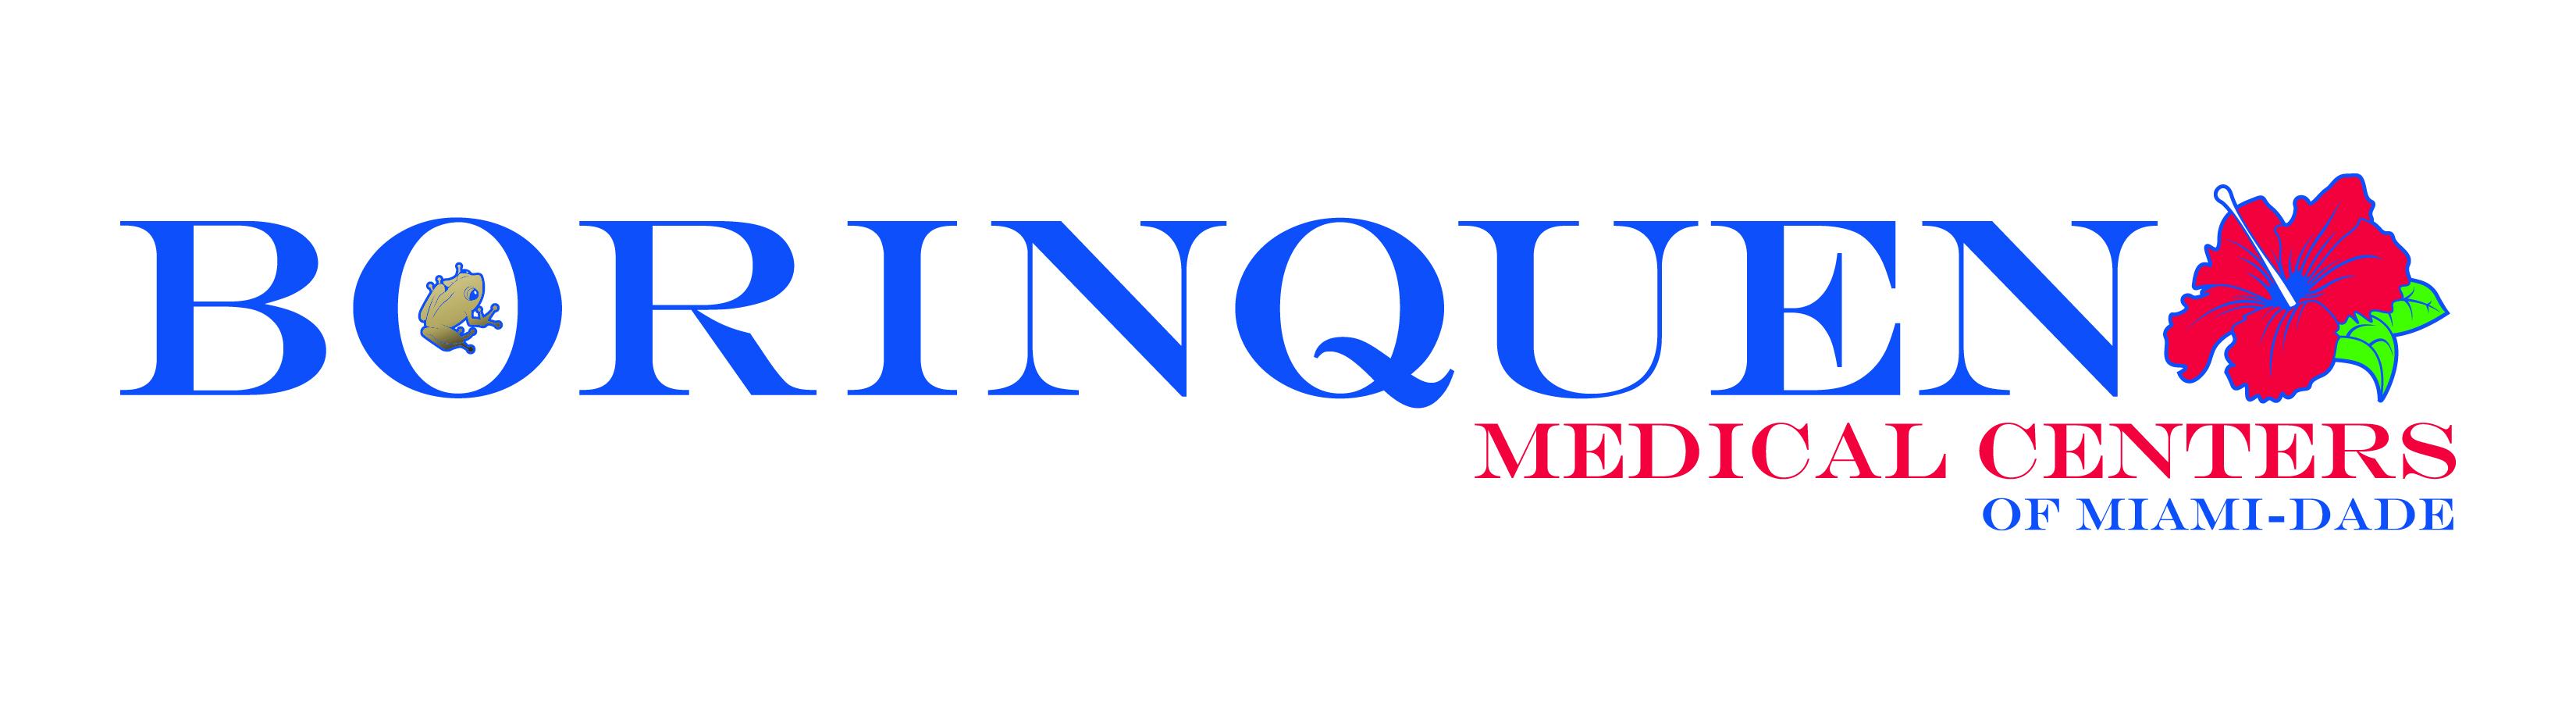 Borinquen Logo